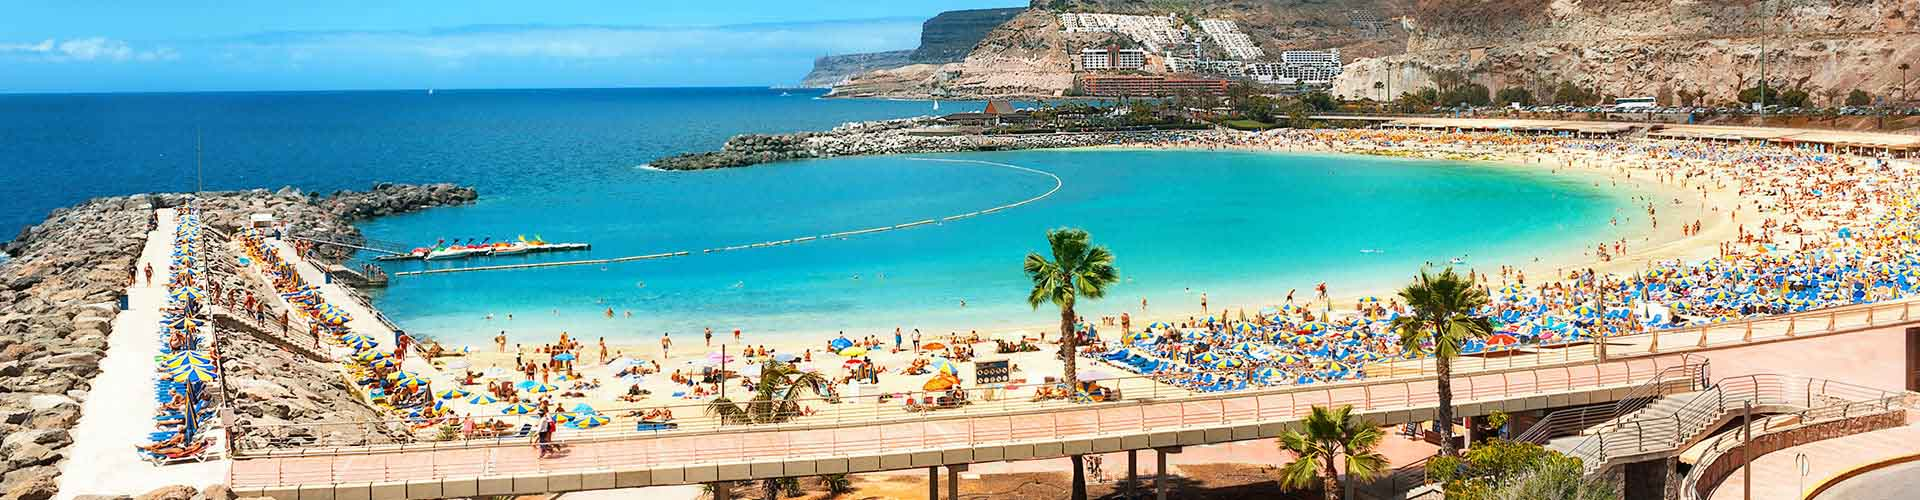 Gran Canaria - Chambres à Gran Canaria. Cartes pour Gran Canaria, photos et commentaires pour chaque chambre à Gran Canaria.